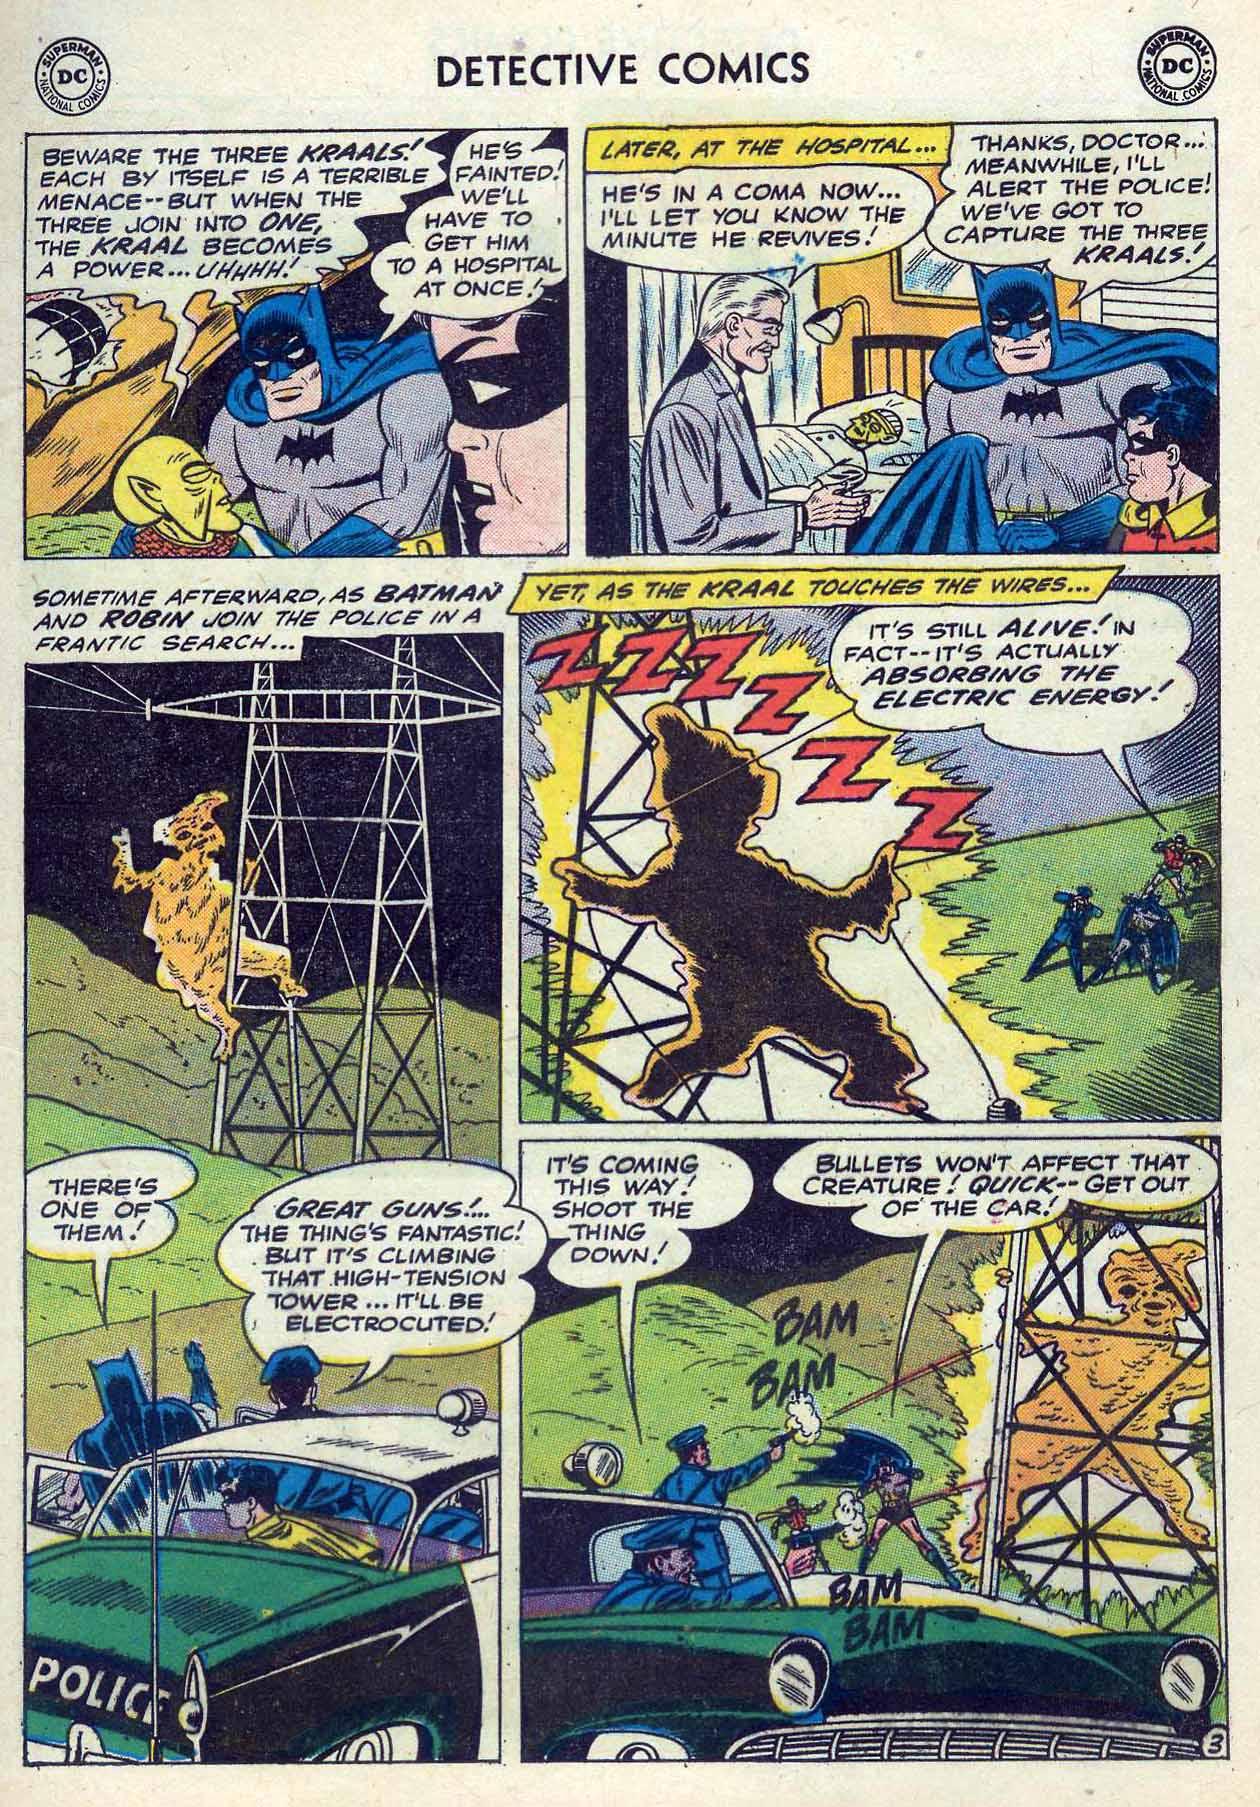 Detective Comics (1937) 277 Page 4